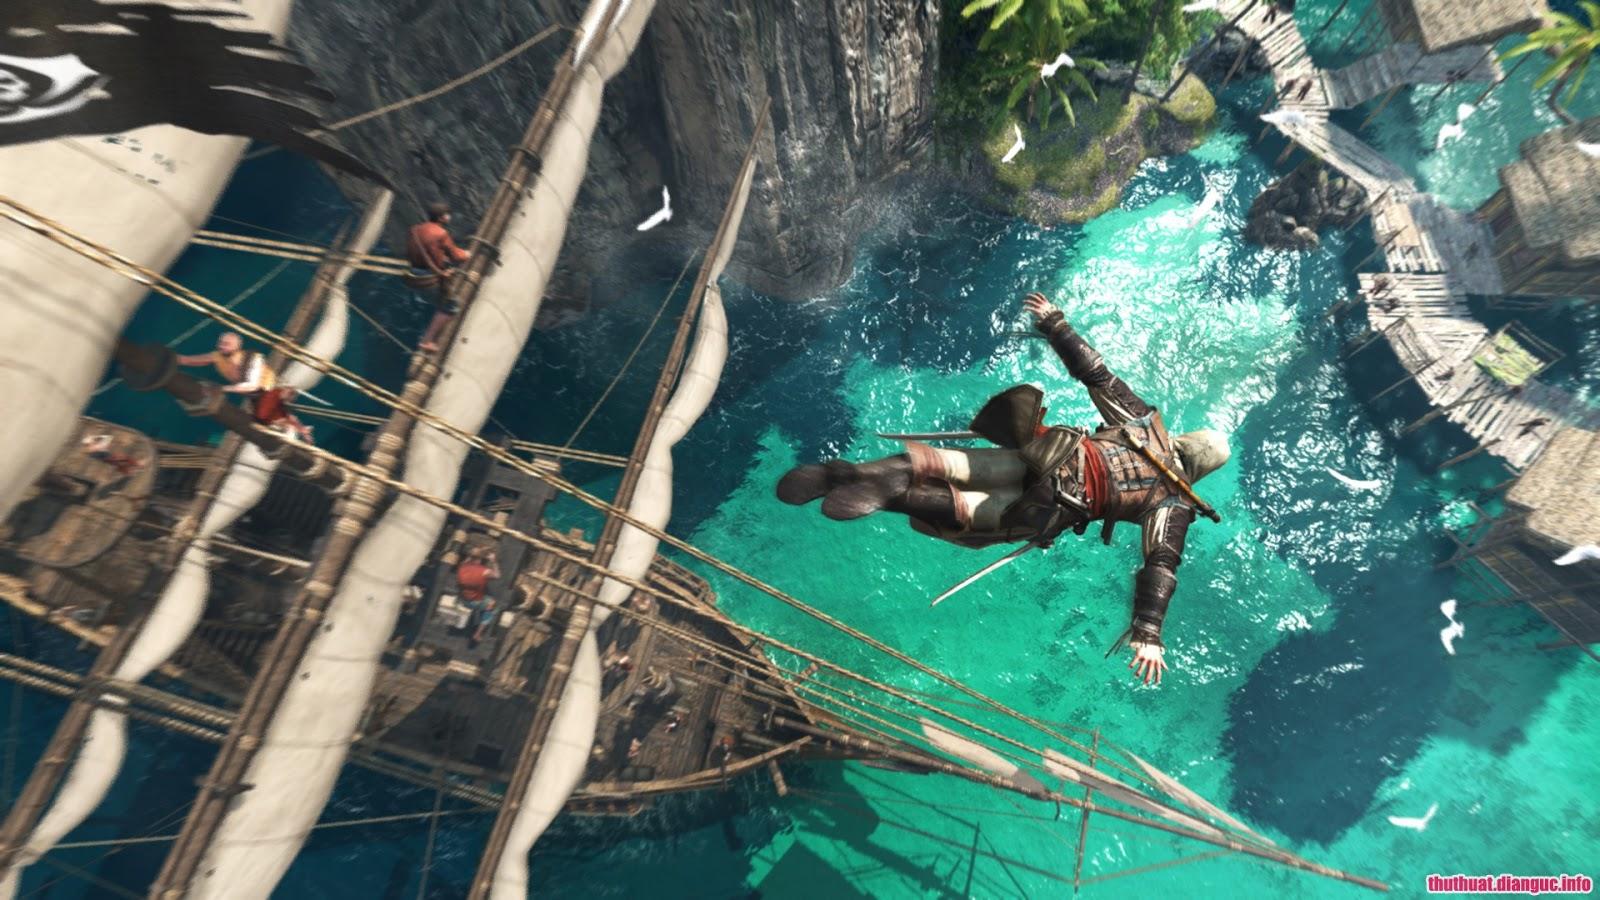 Game Assassin's Creed IV: Black Flag, Assassin's Creed IV: Black Flag, Assassin's Creed 4, Sát thủ vùng Caribbean